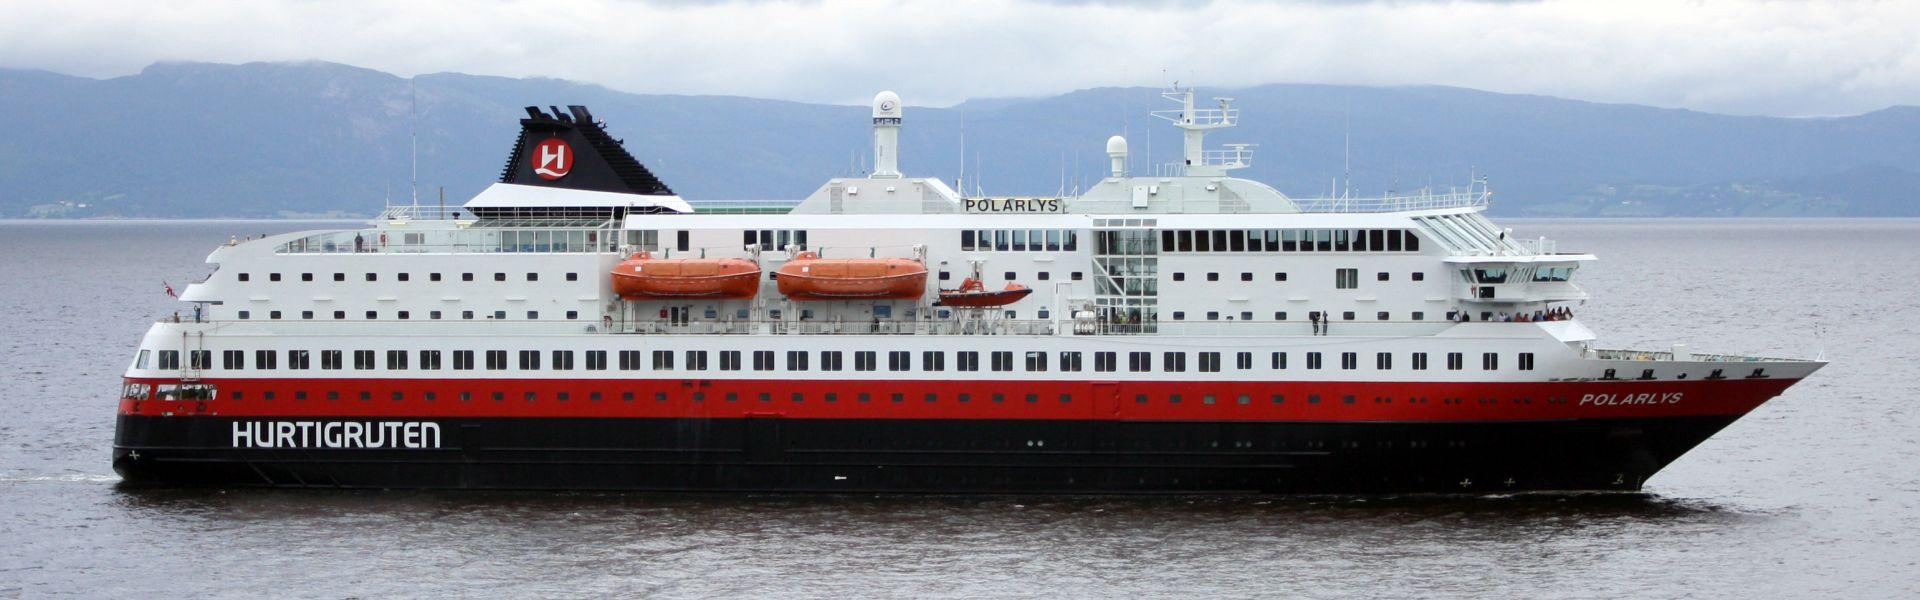 Croaziera 2017 - Scandinavia si Fiordurile Norvegiene (Kirkenes) - Hurtigruten - MS Polarlys - 5 nopti